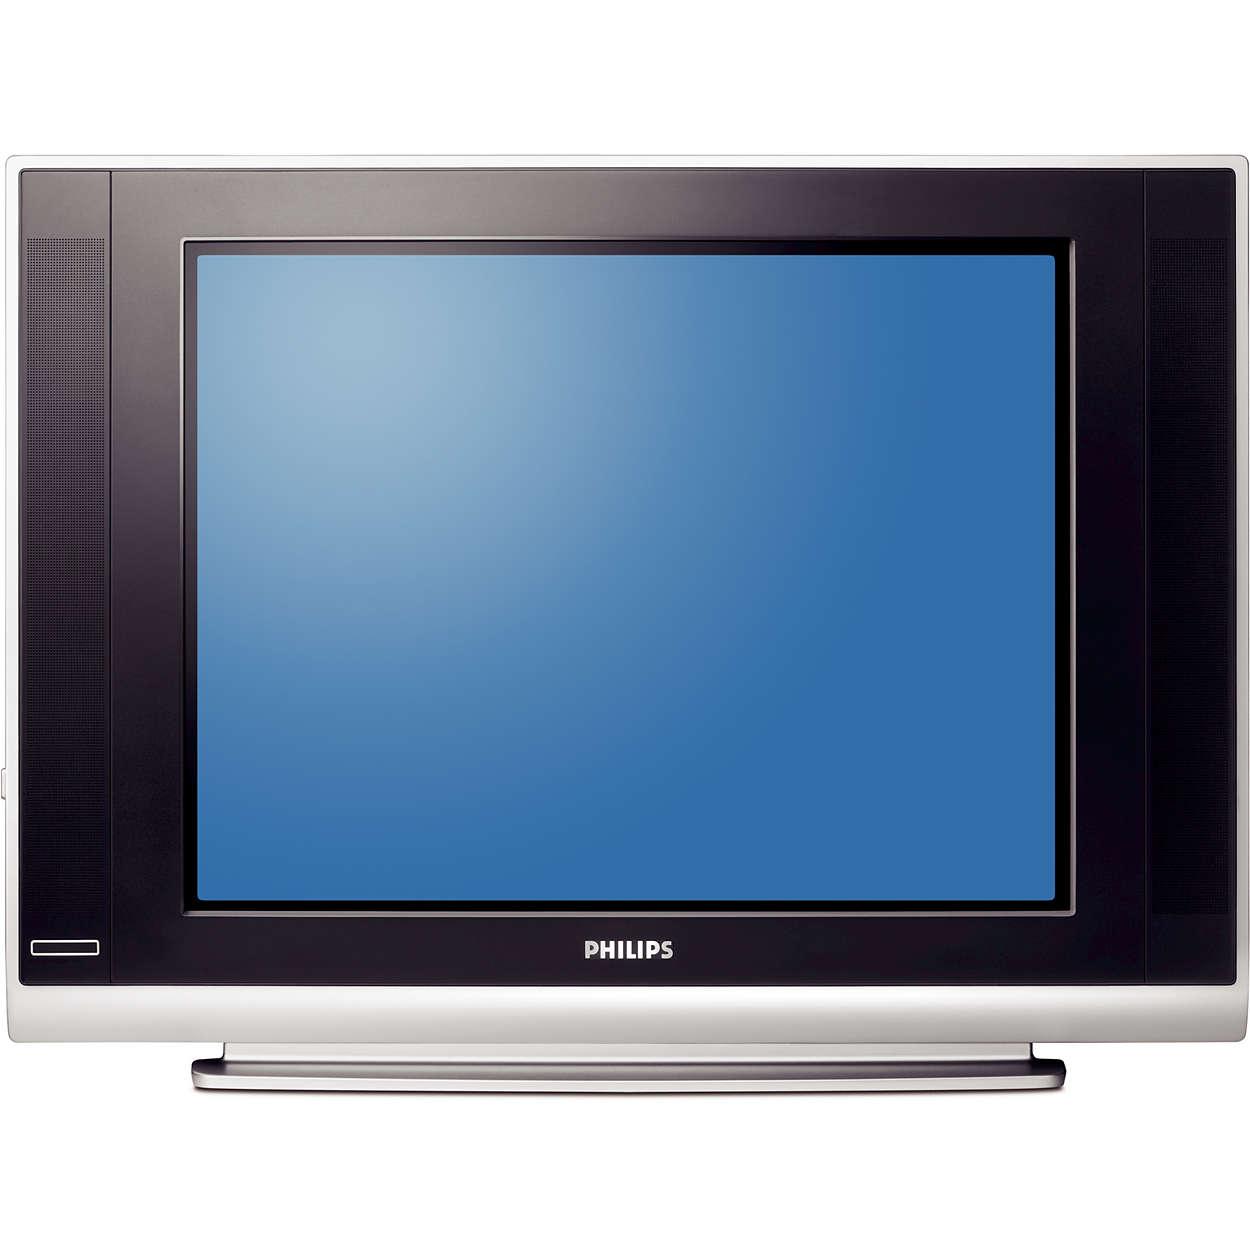 TV 29PT5607/94 | Philips